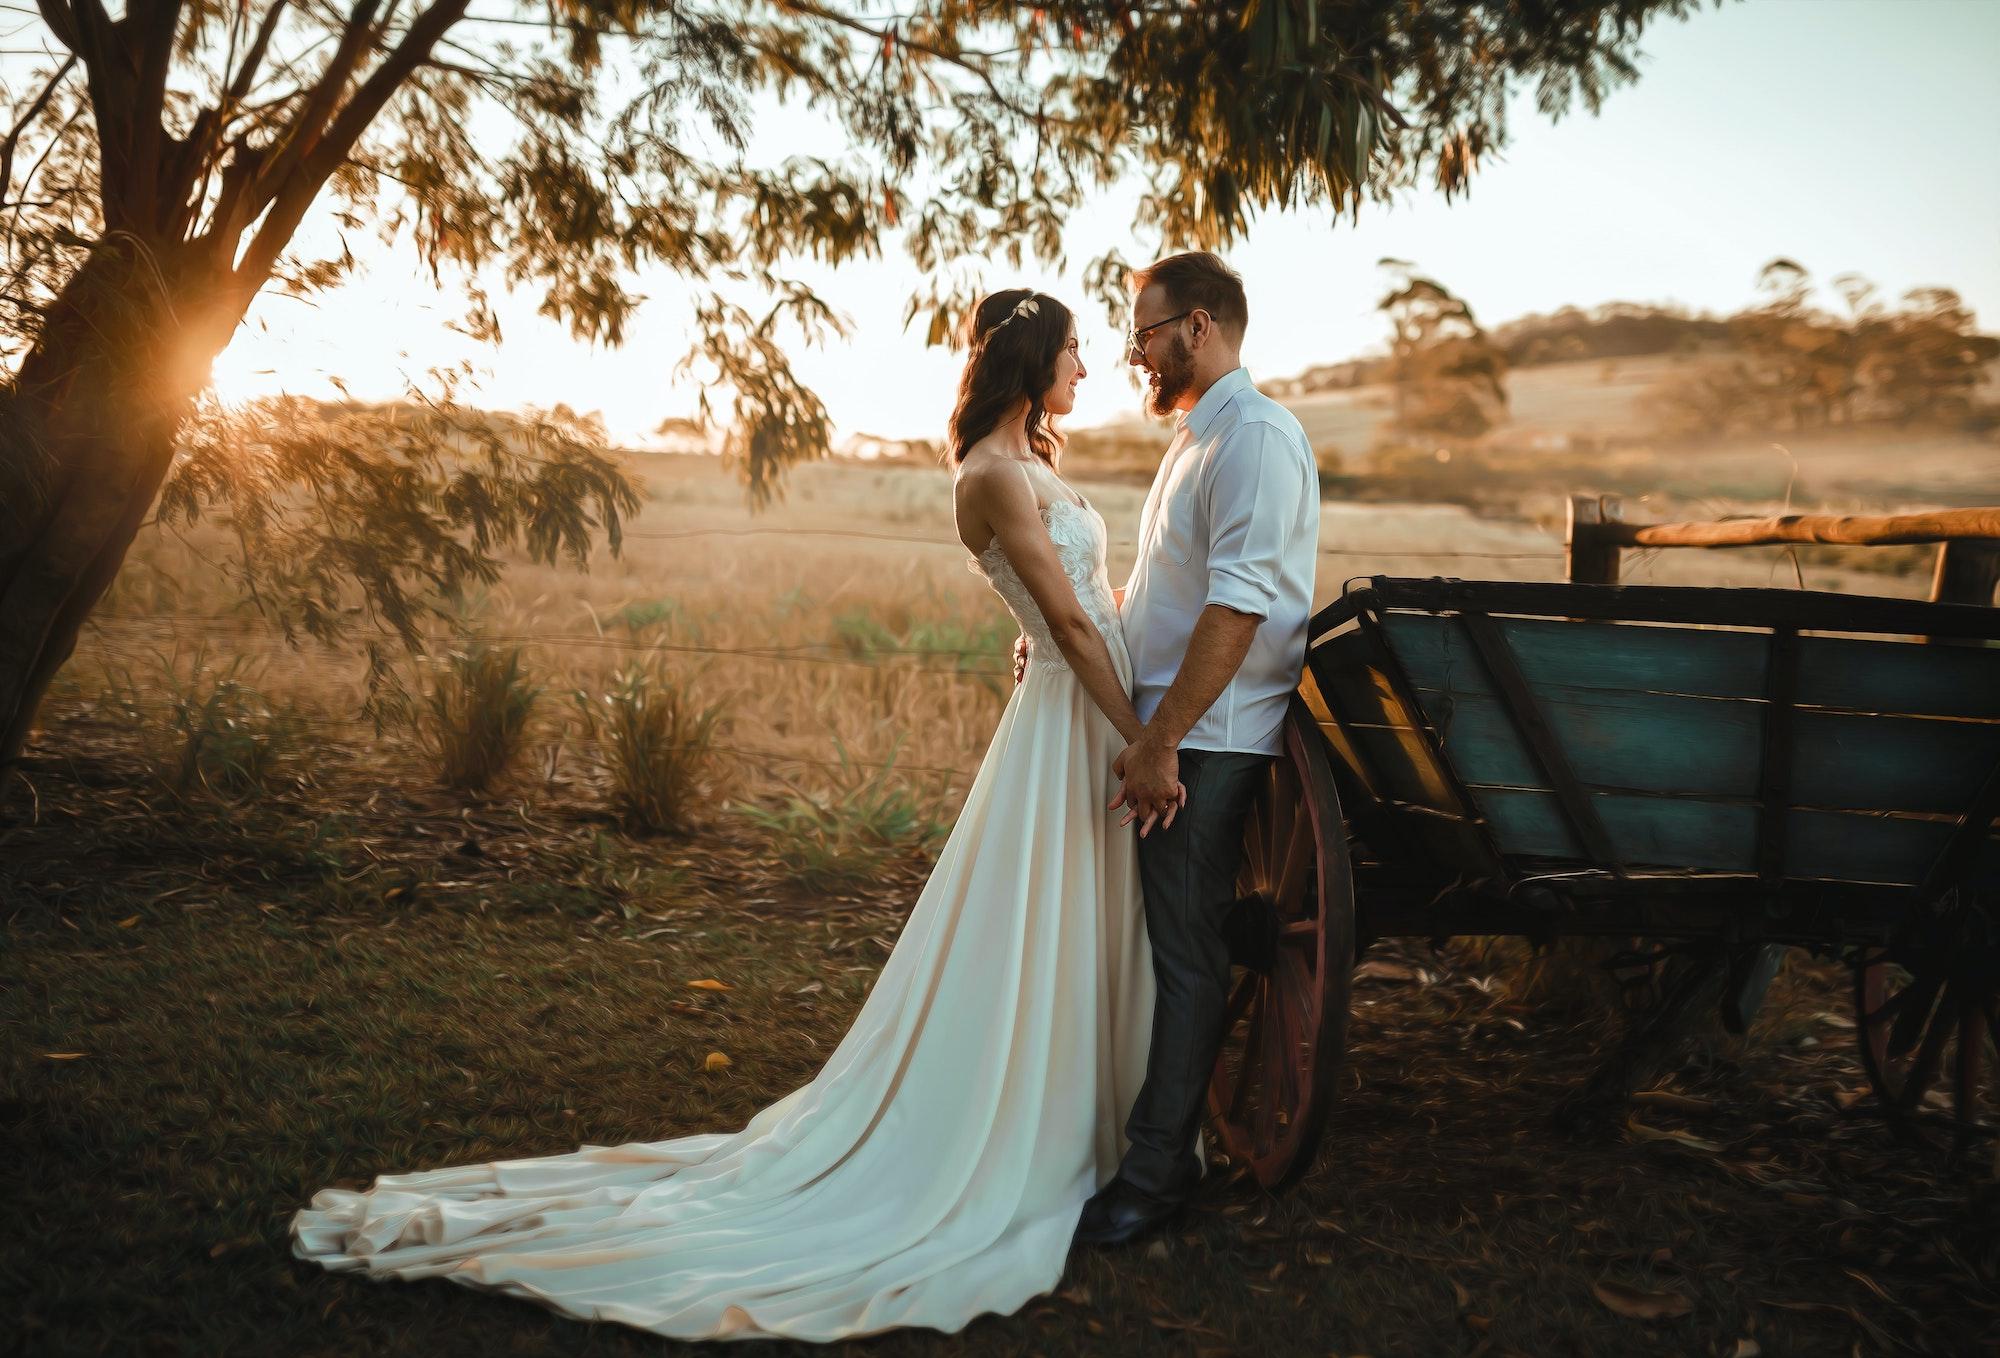 Engaged | How to have the best woodland wedding | Wedding tips | Elle Blonde Luxury Lifestyle Destination Blog